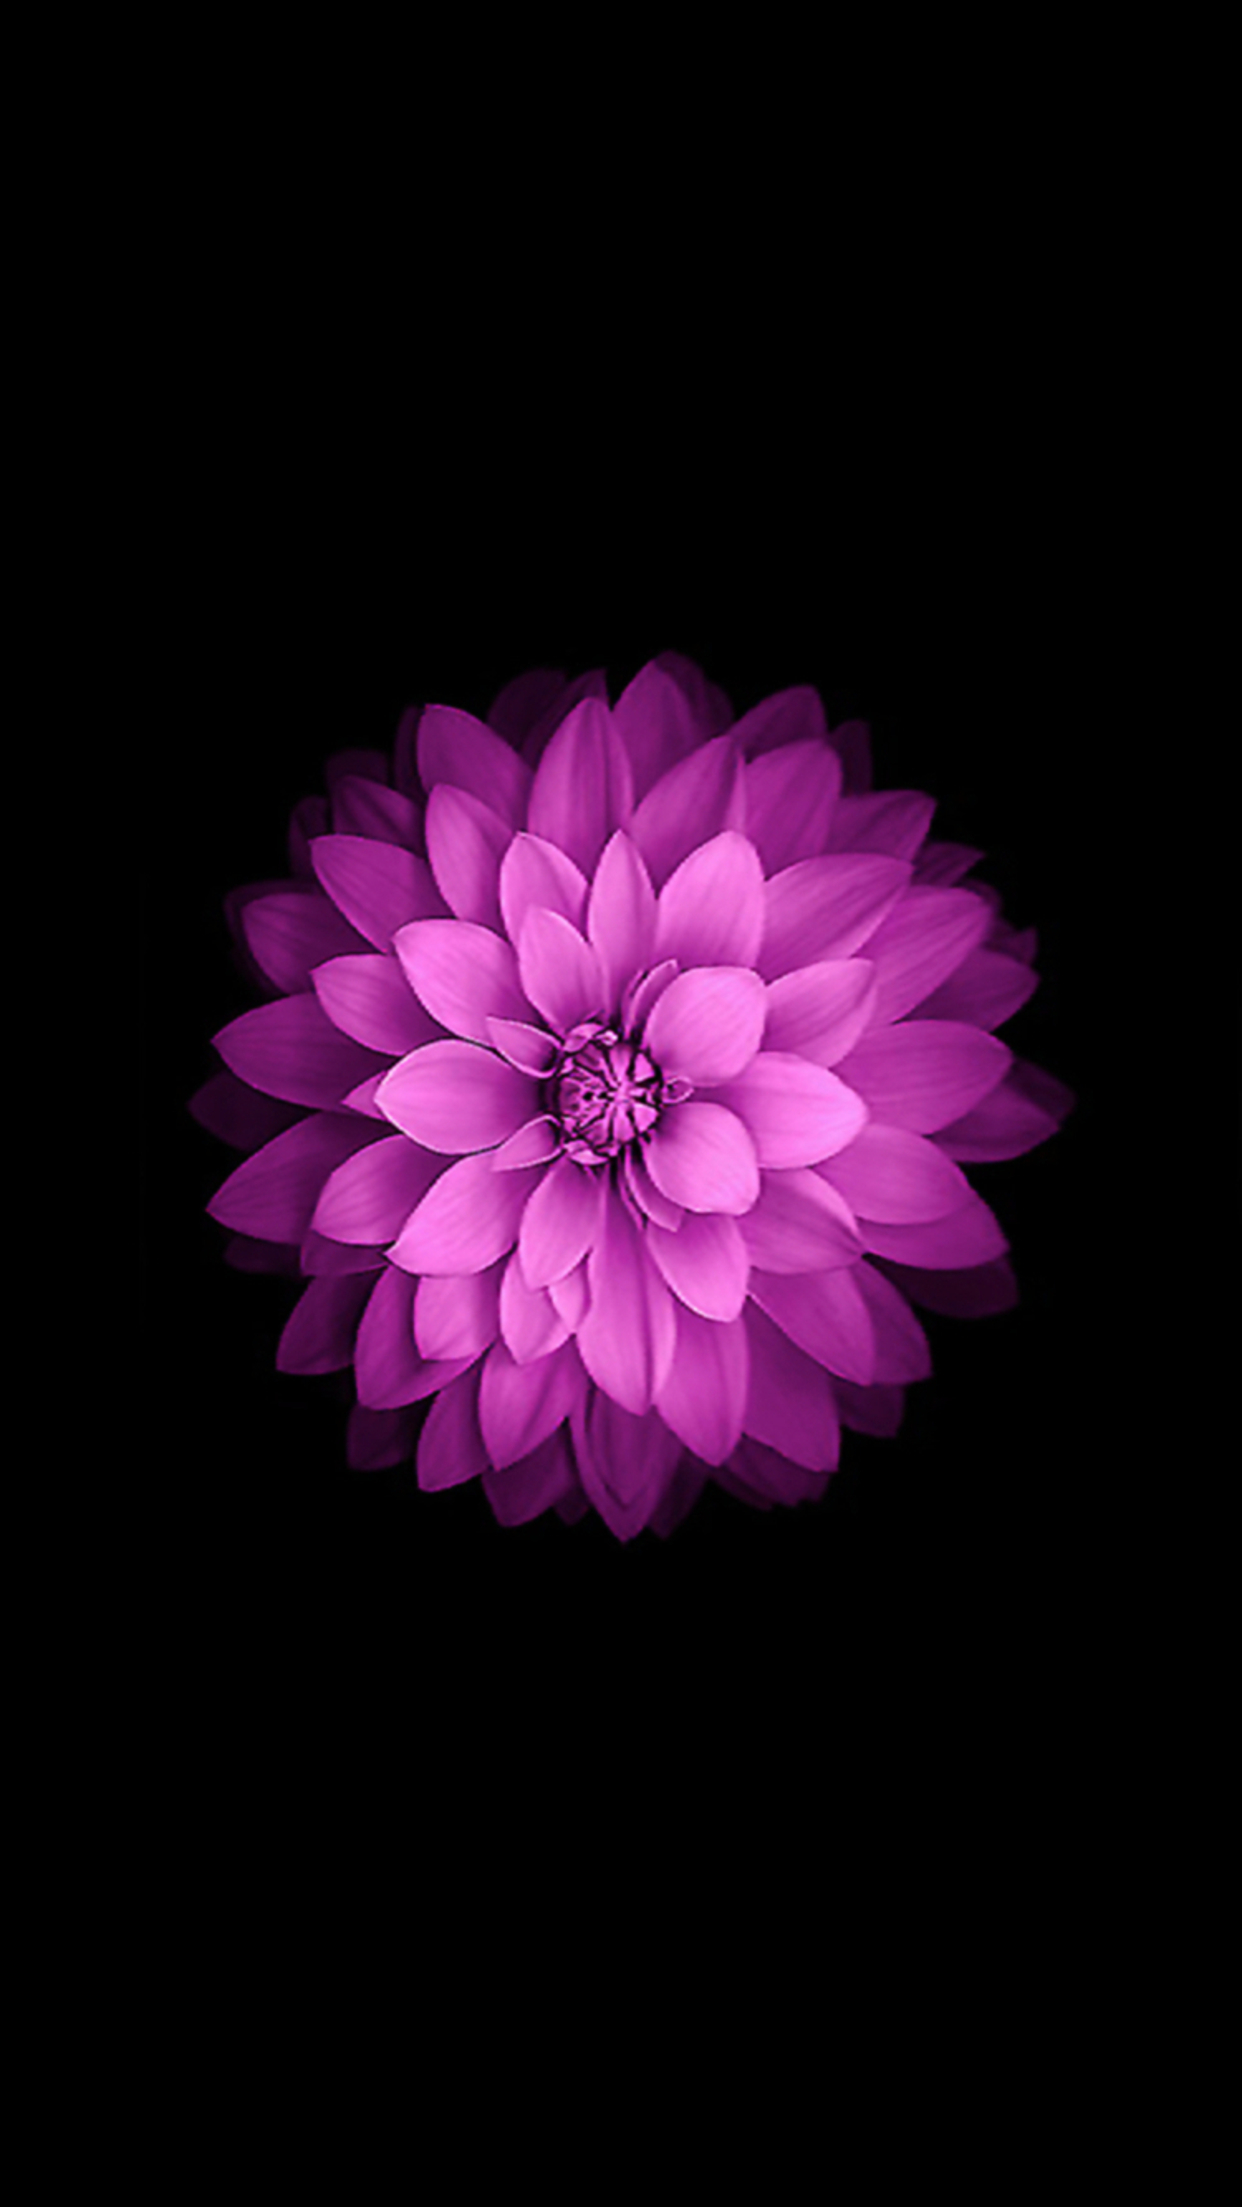 Top Wallpaper Iphone 7 Flowers Electro Sphere